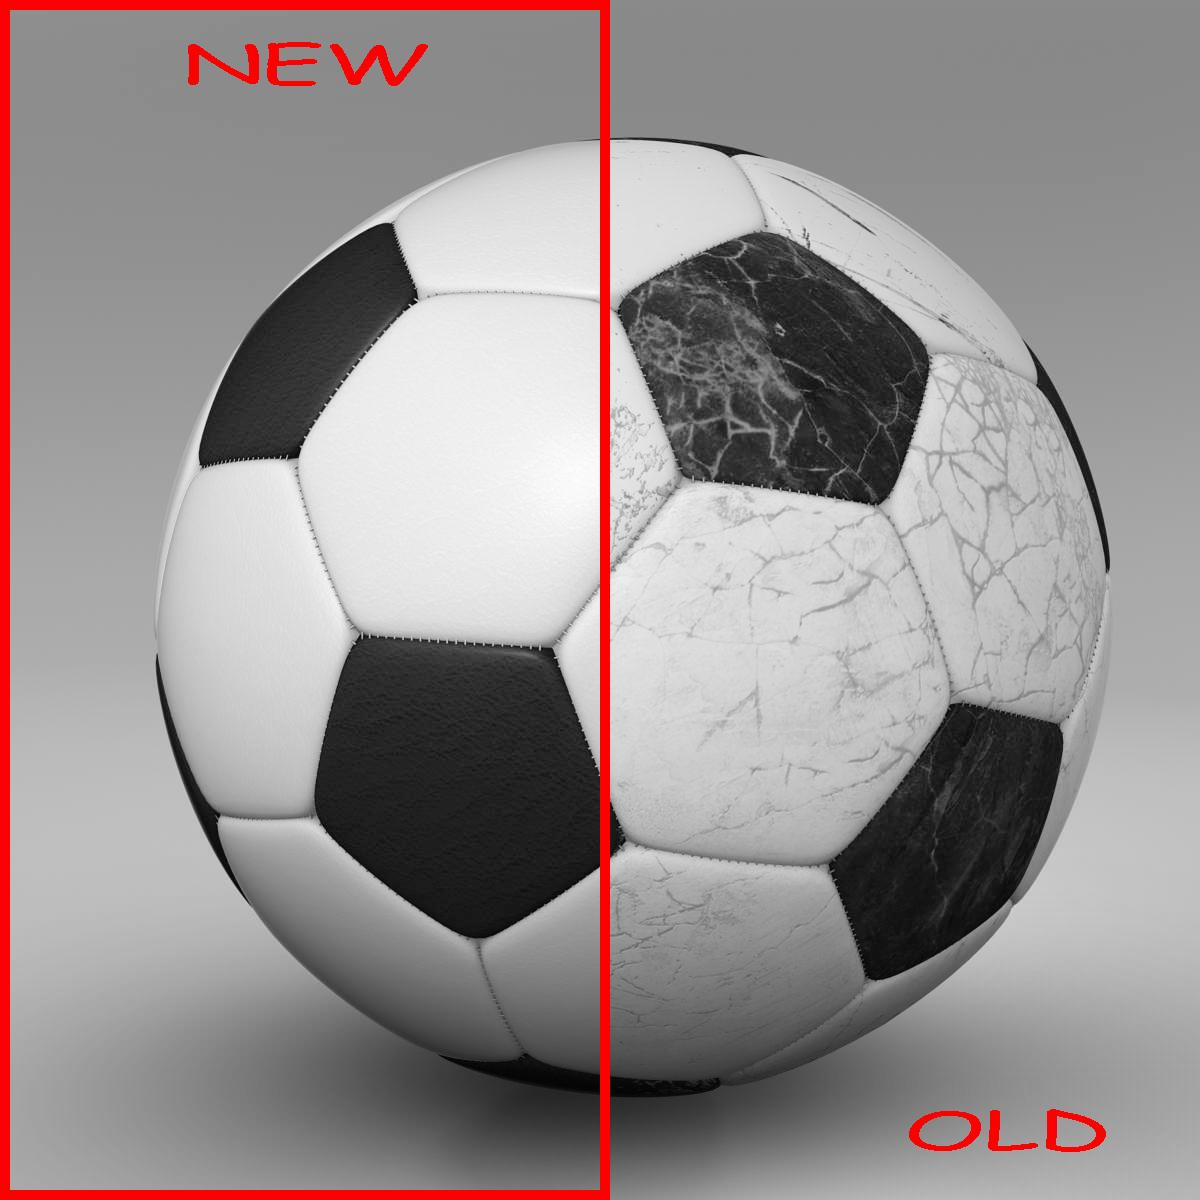 soccerball svartur hvítur 3d líkan 3ds max fbx c4d ma mb obj 203948